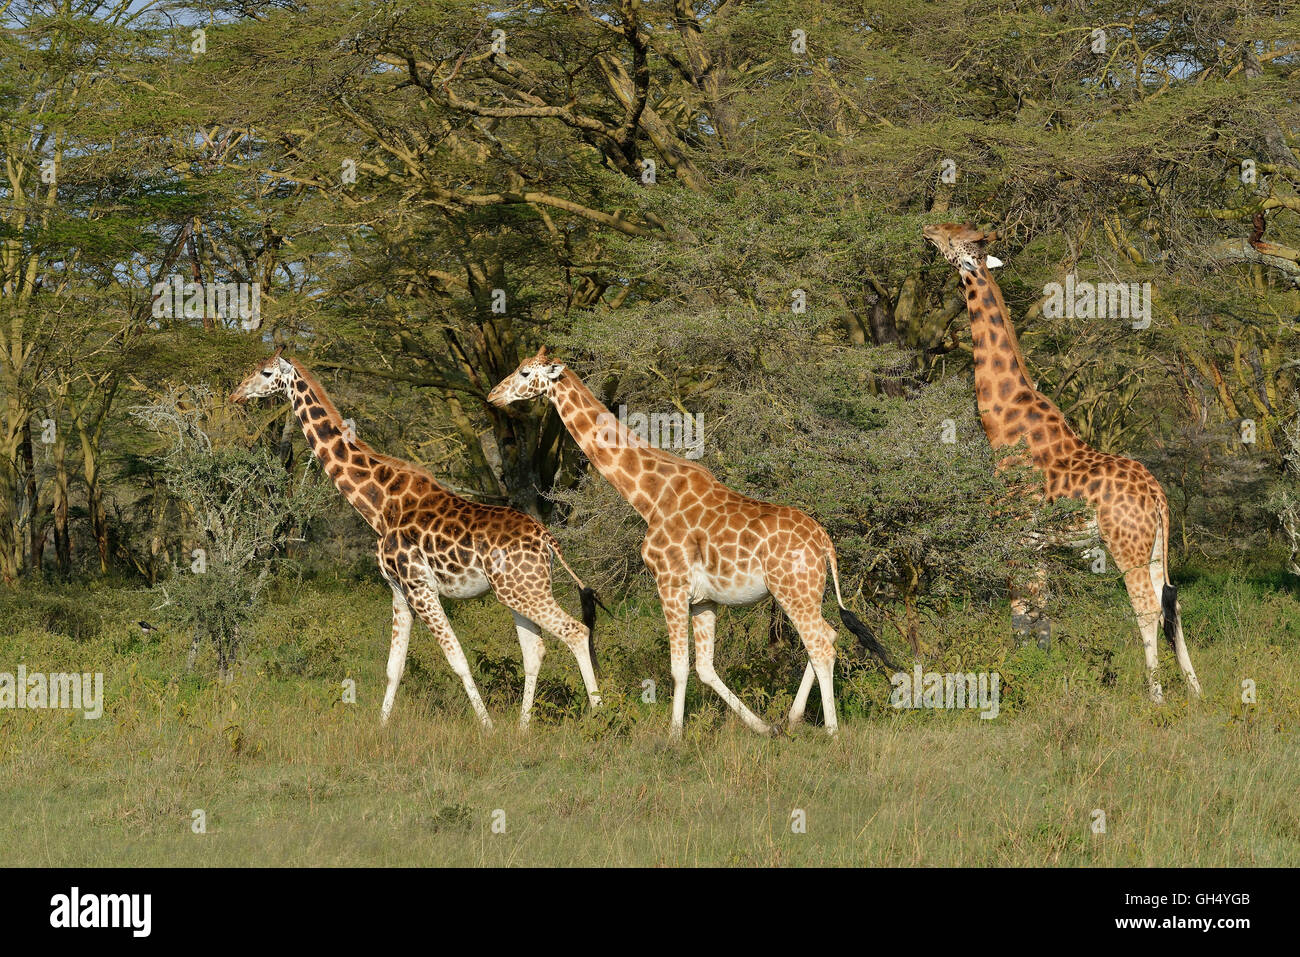 zoology / animals, mammal (mammalia), Rothschild's, Baringo- or Ugandan giraffes (Giraffa camelopardalis rothschildi), - Stock Image